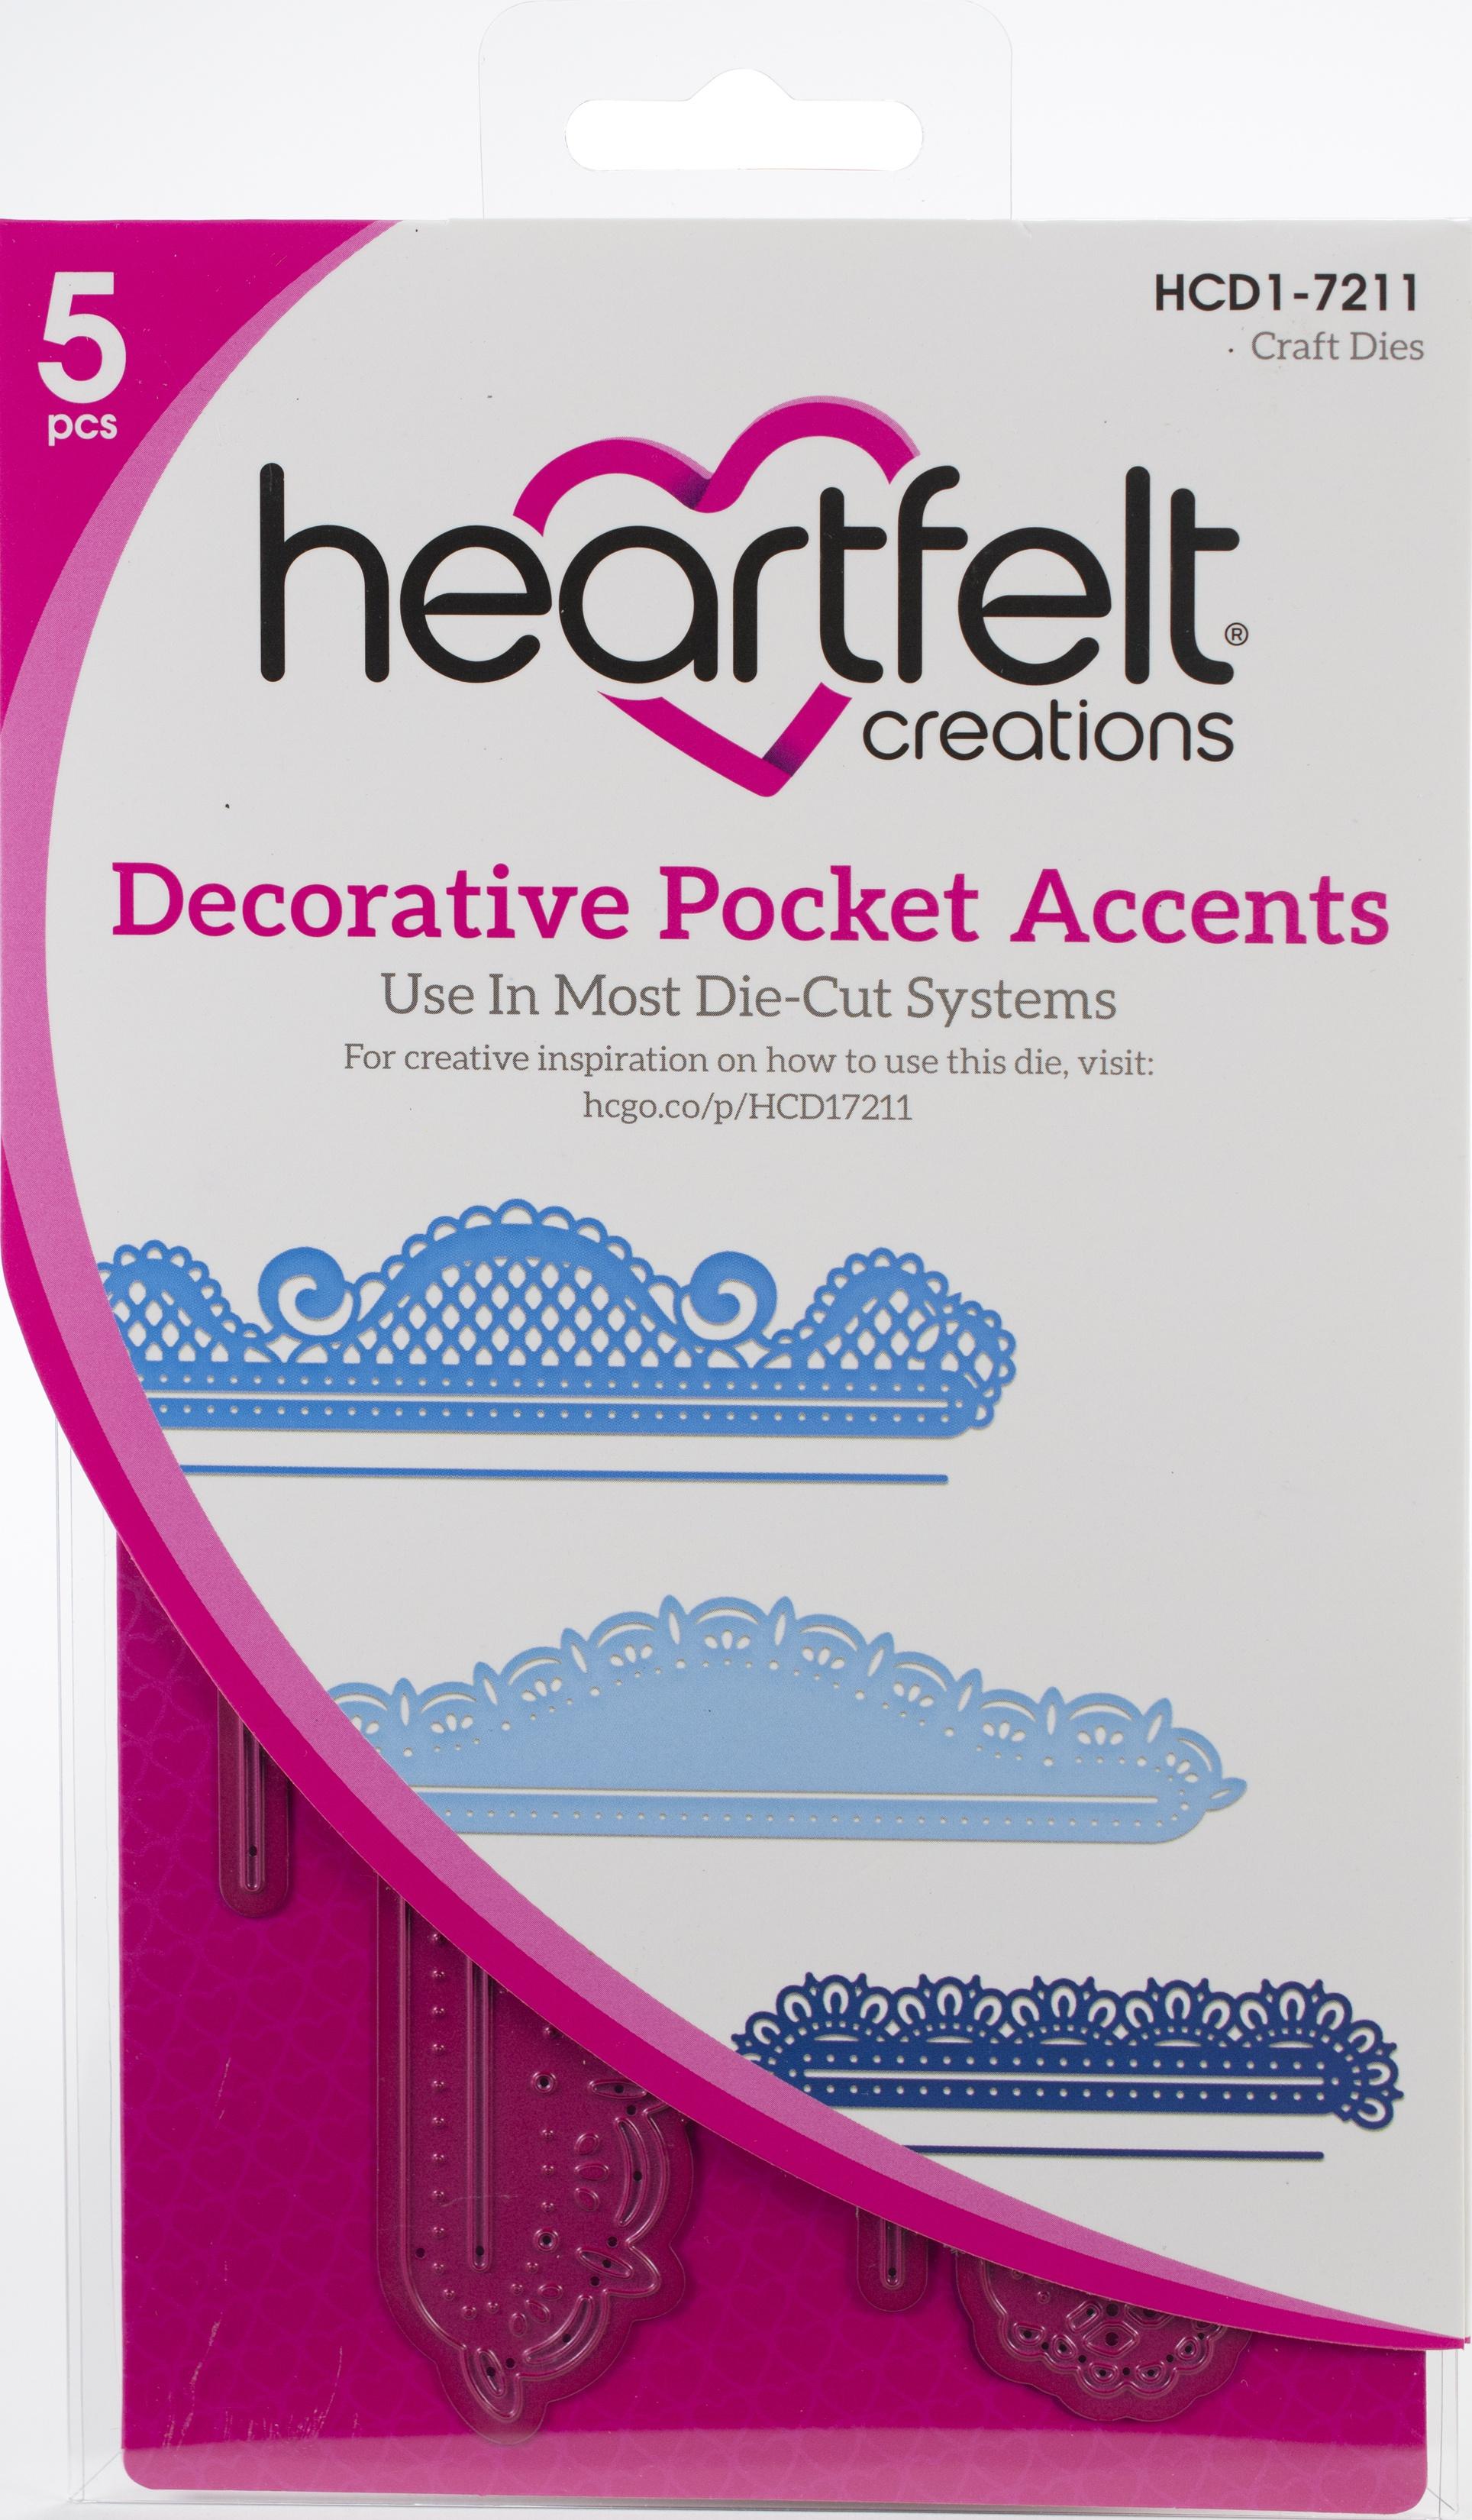 Heartfelt Creations Decorative Pocket Accents Die